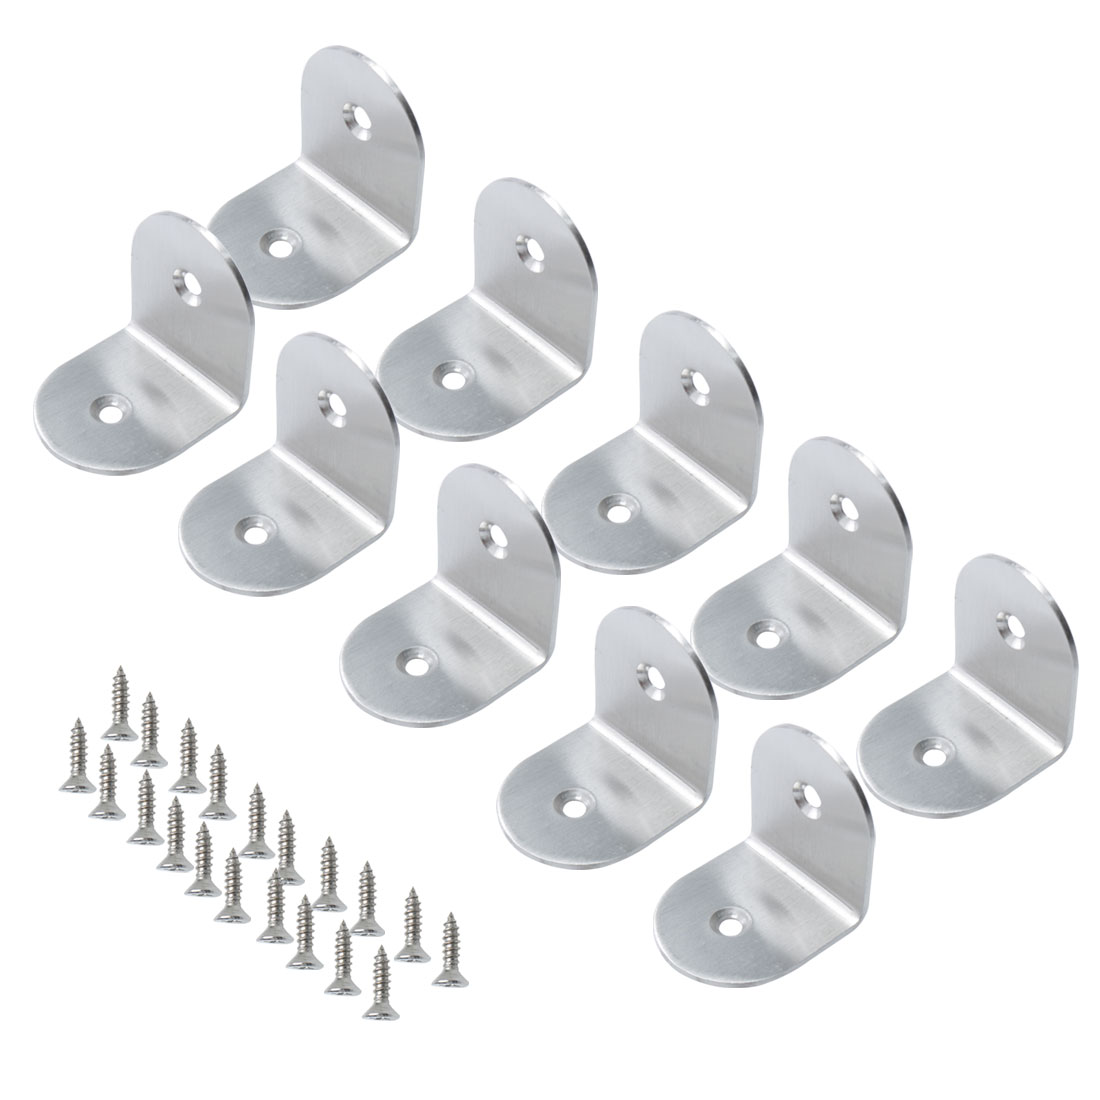 Angle Bracket Stainless Steel Brace Fastener Support w Screw 40x40mm, 10pcs